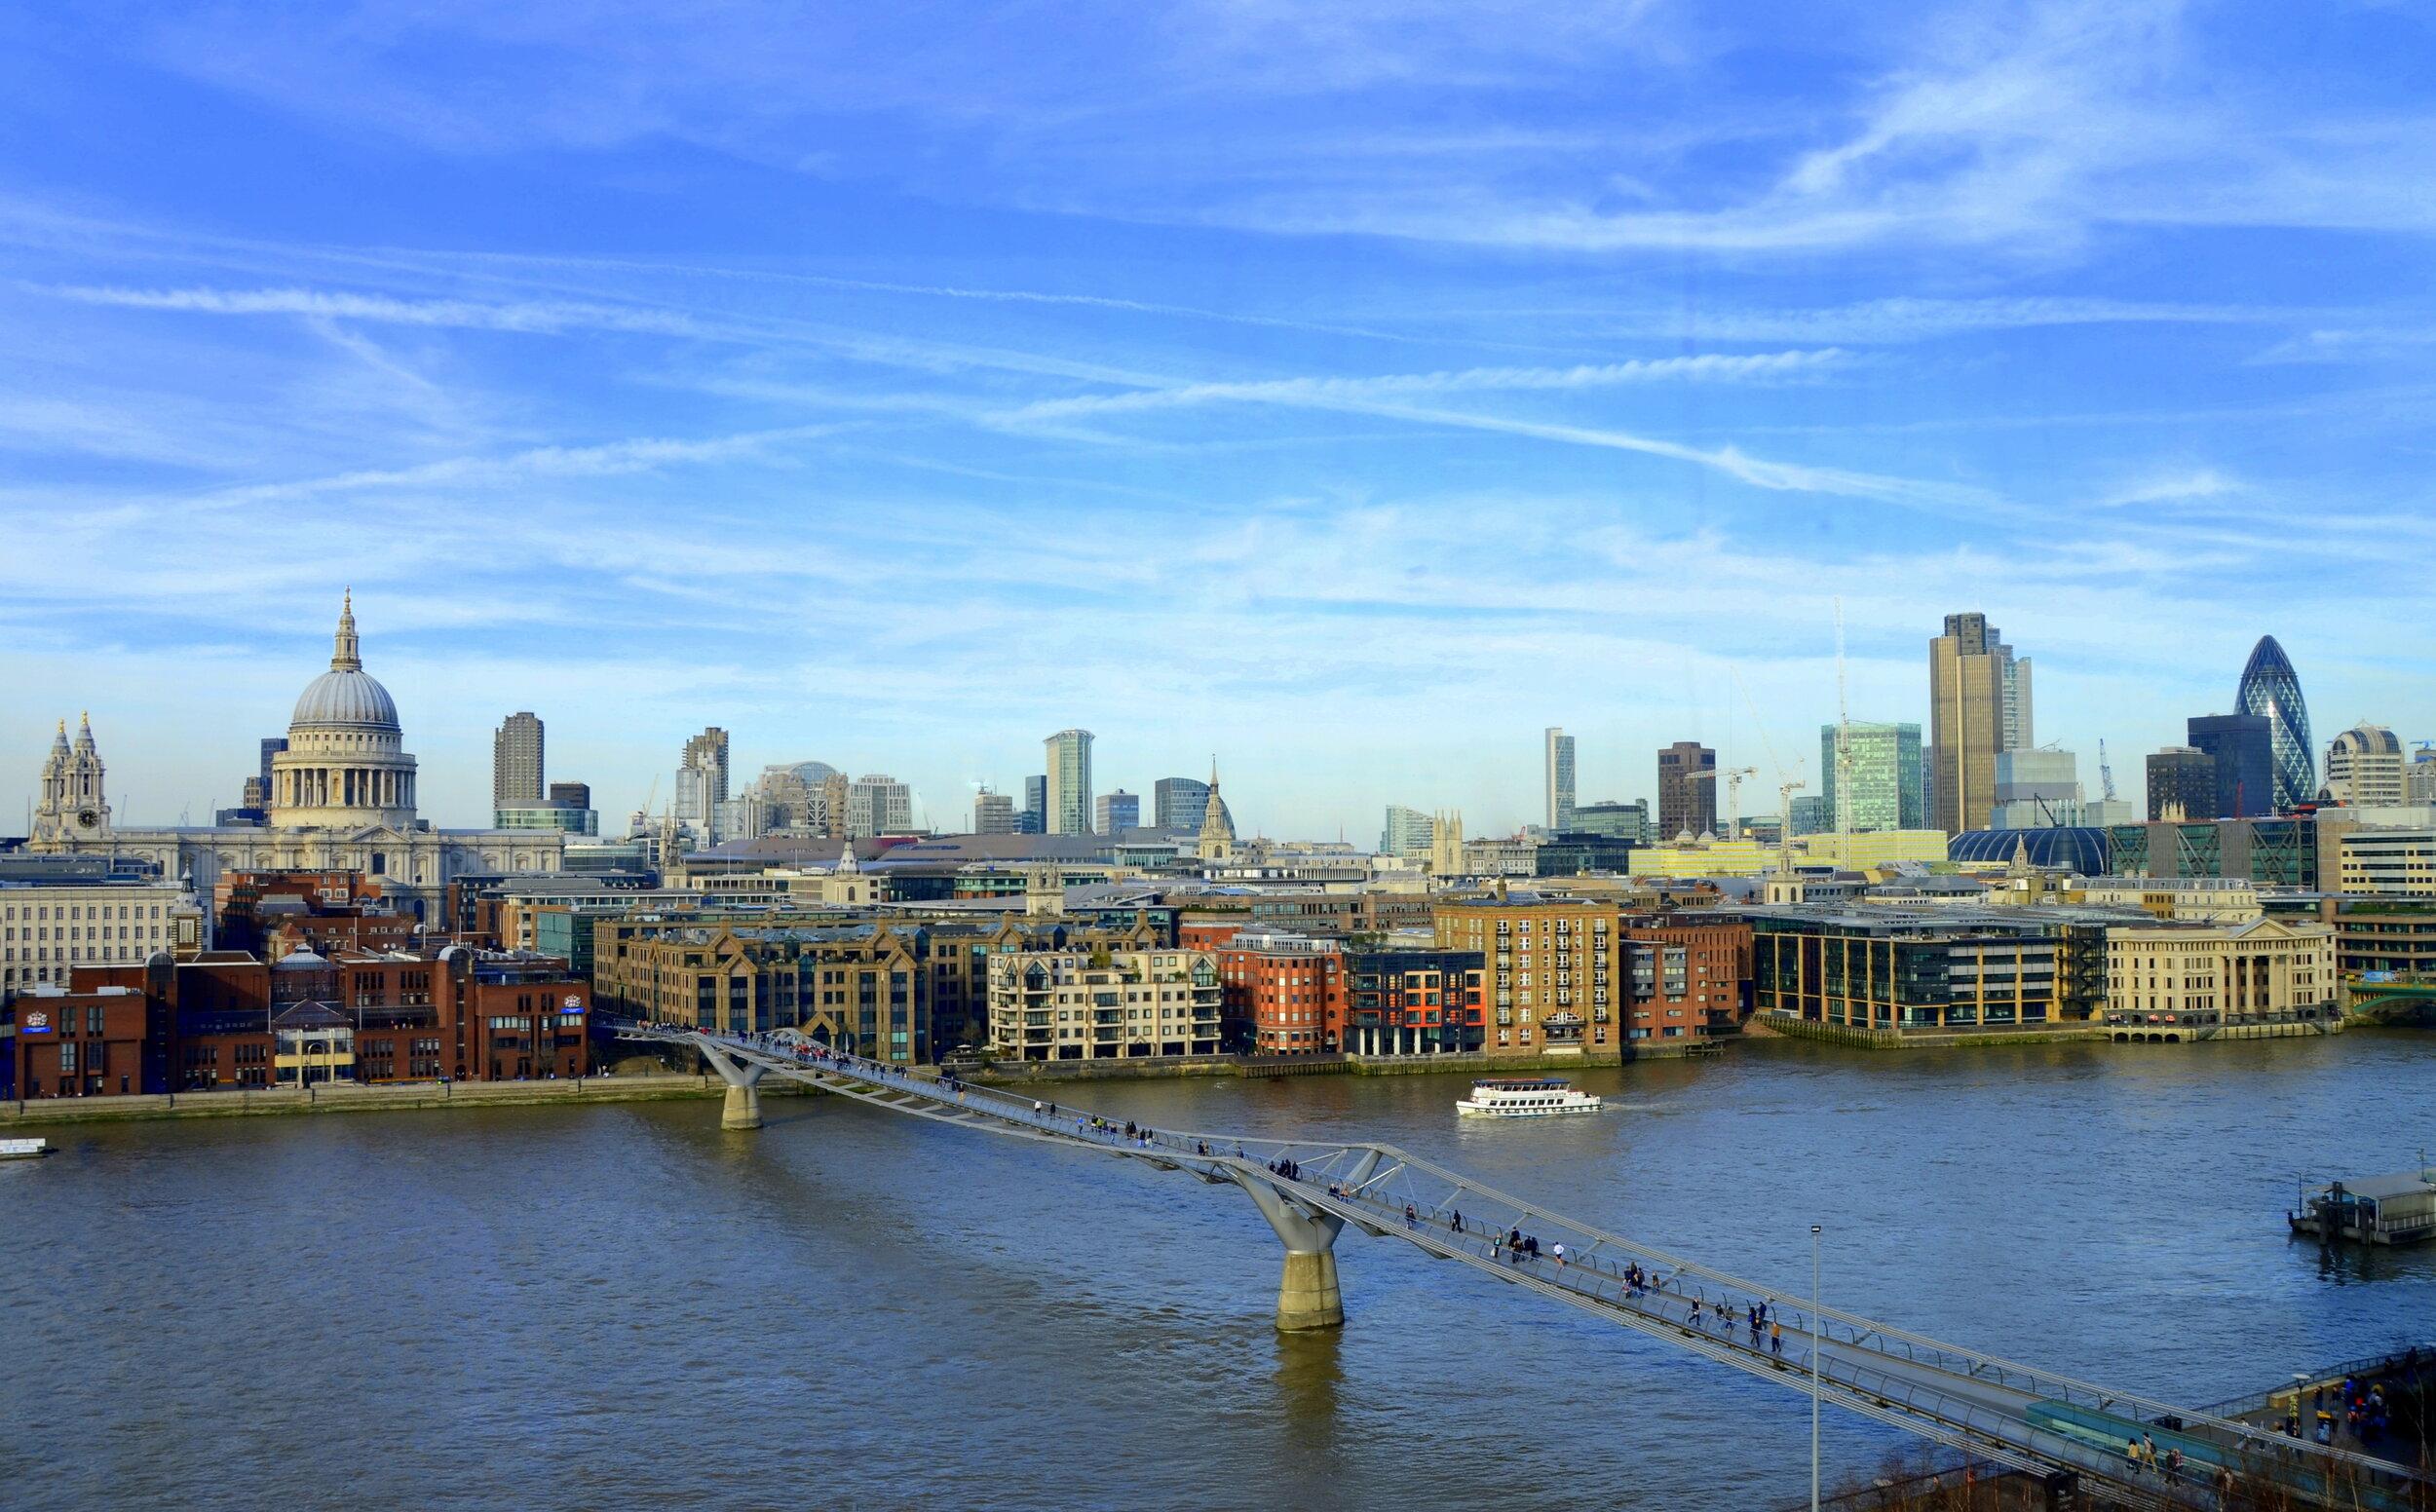 Skyline from Tate Modern, London